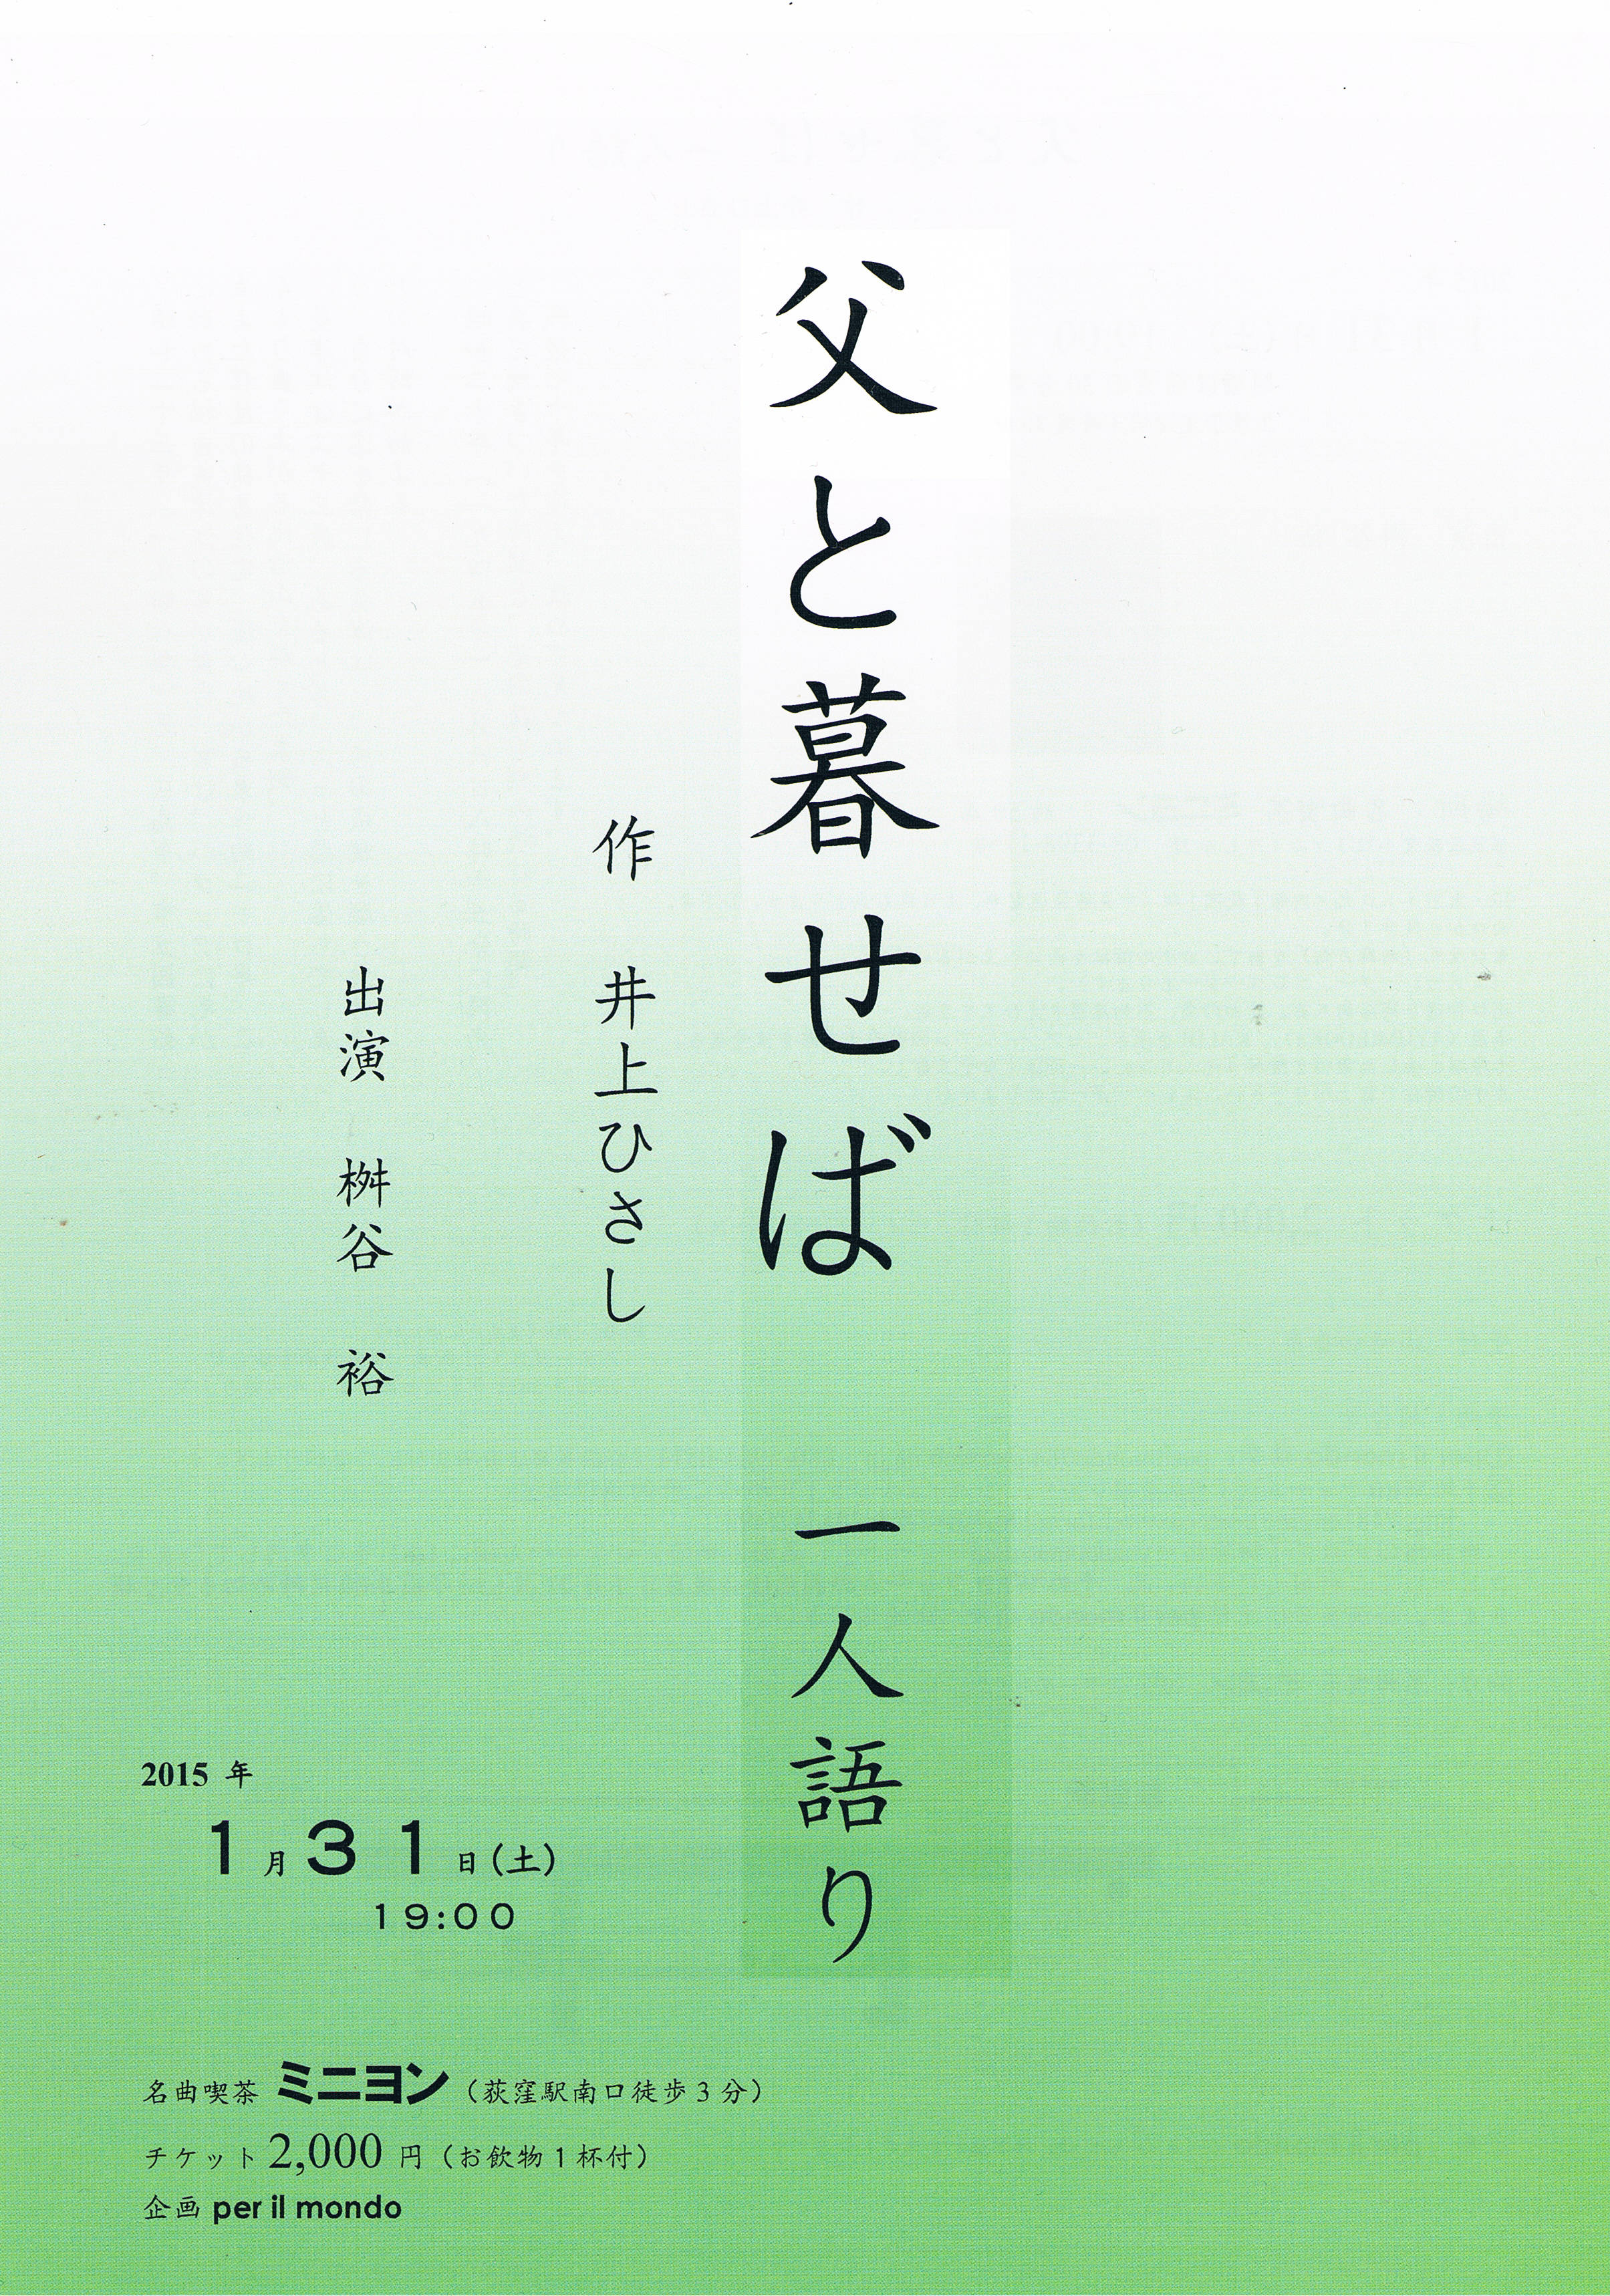 CCF20141213_00000「父と暮せば」一人語り2015Jan 表面